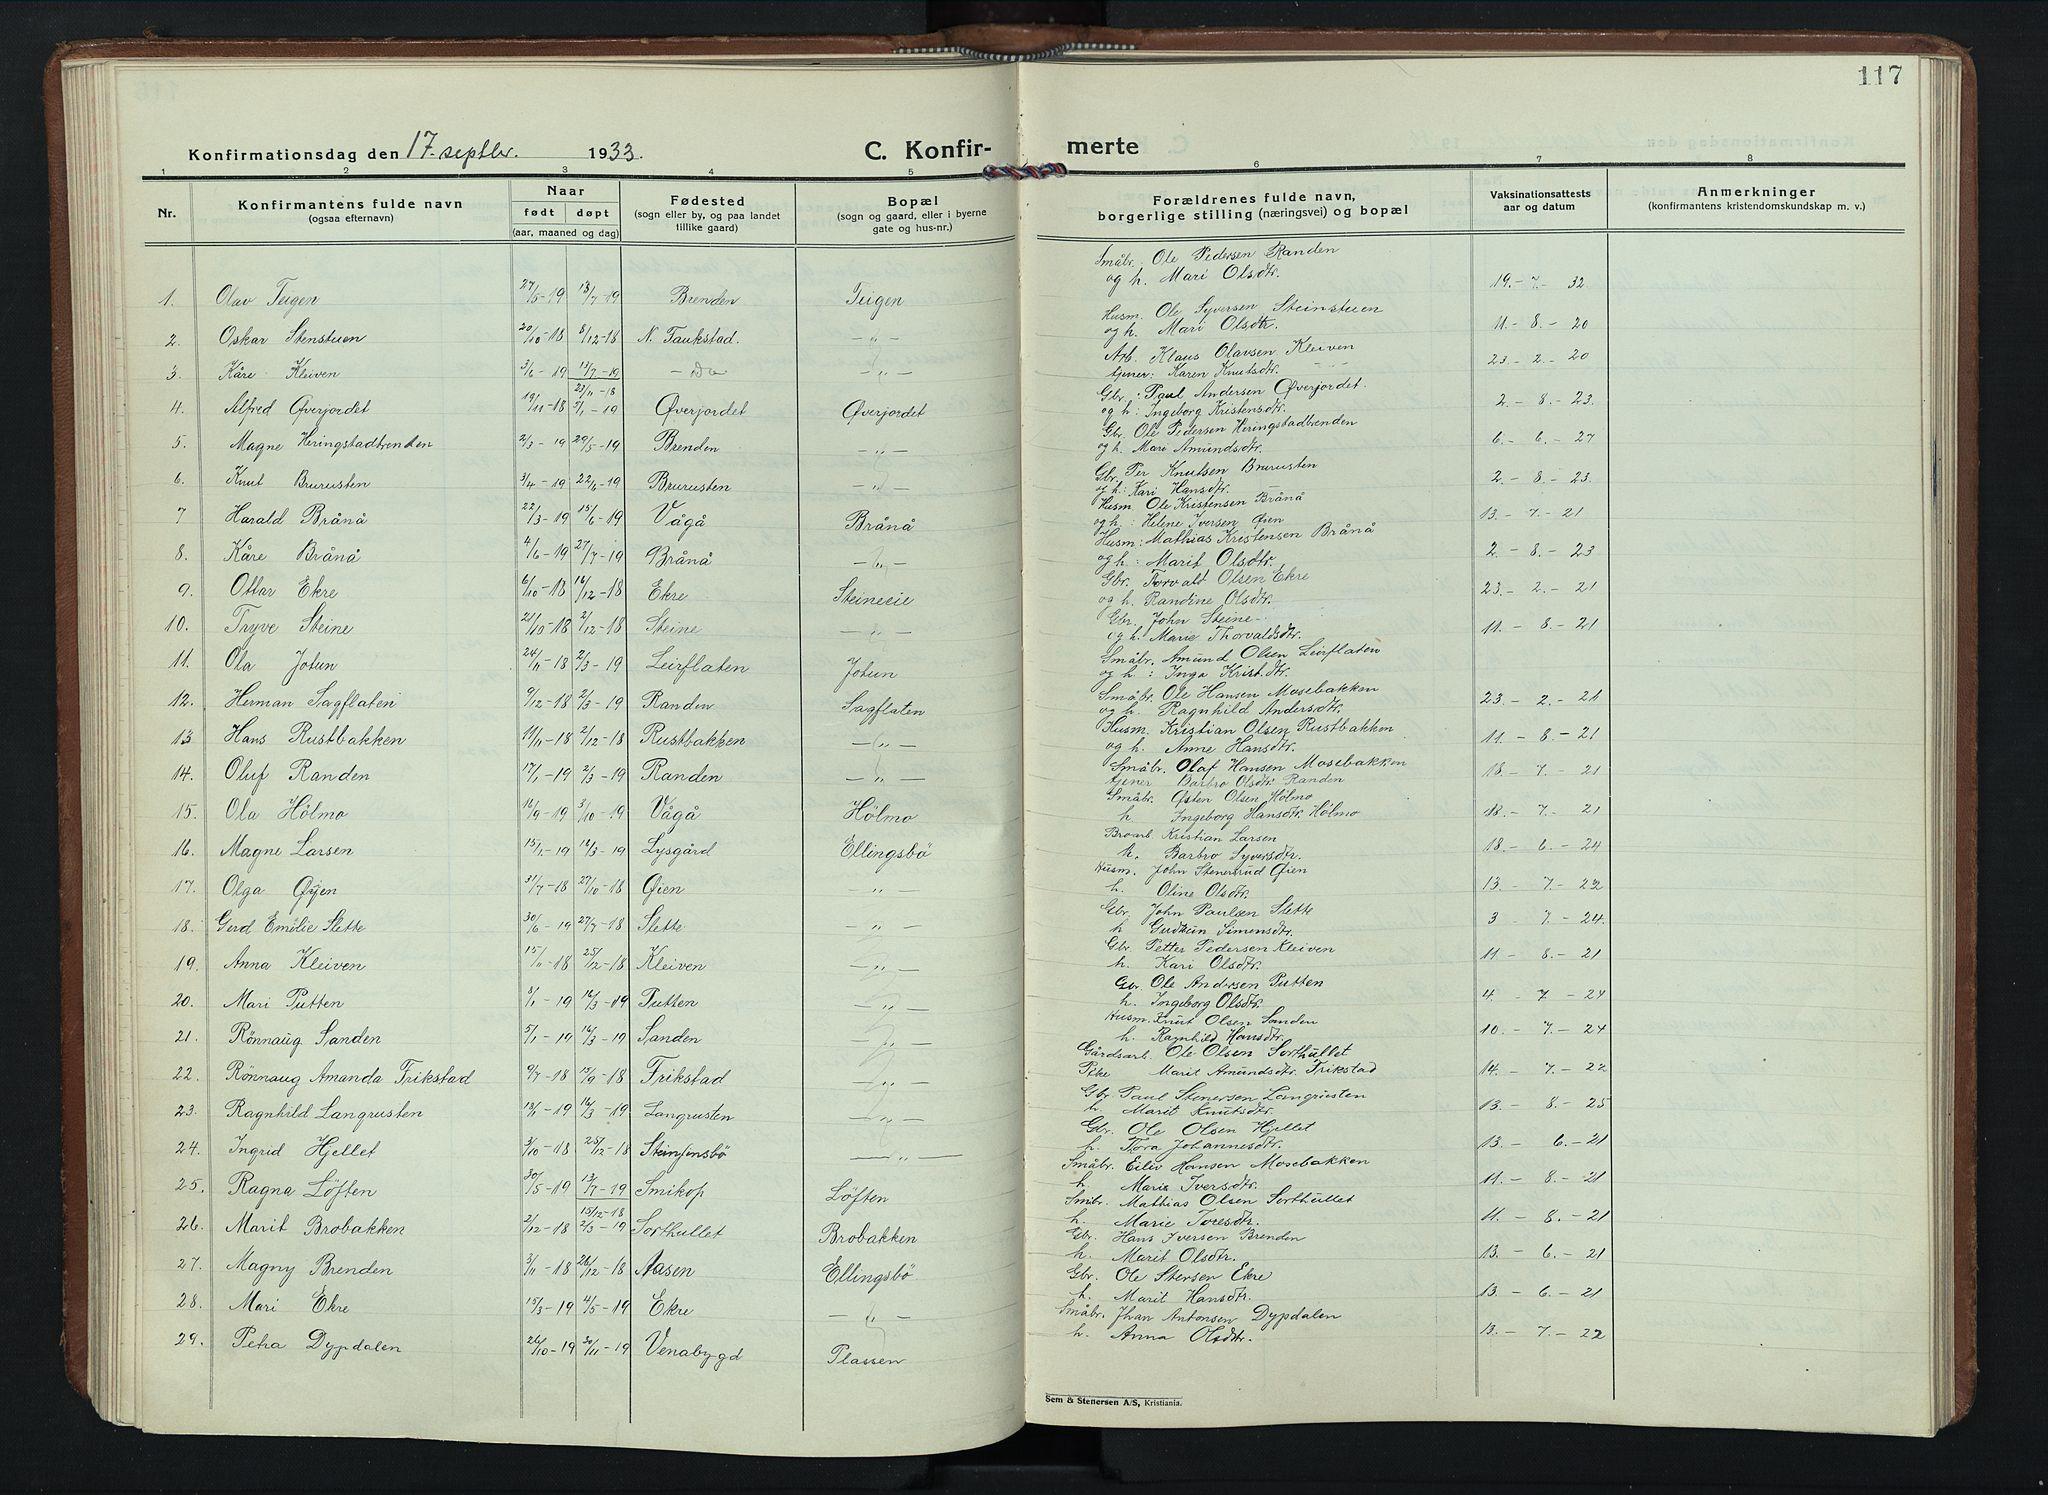 SAH, Sel prestekontor, Klokkerbok nr. 6, 1923-1953, s. 117